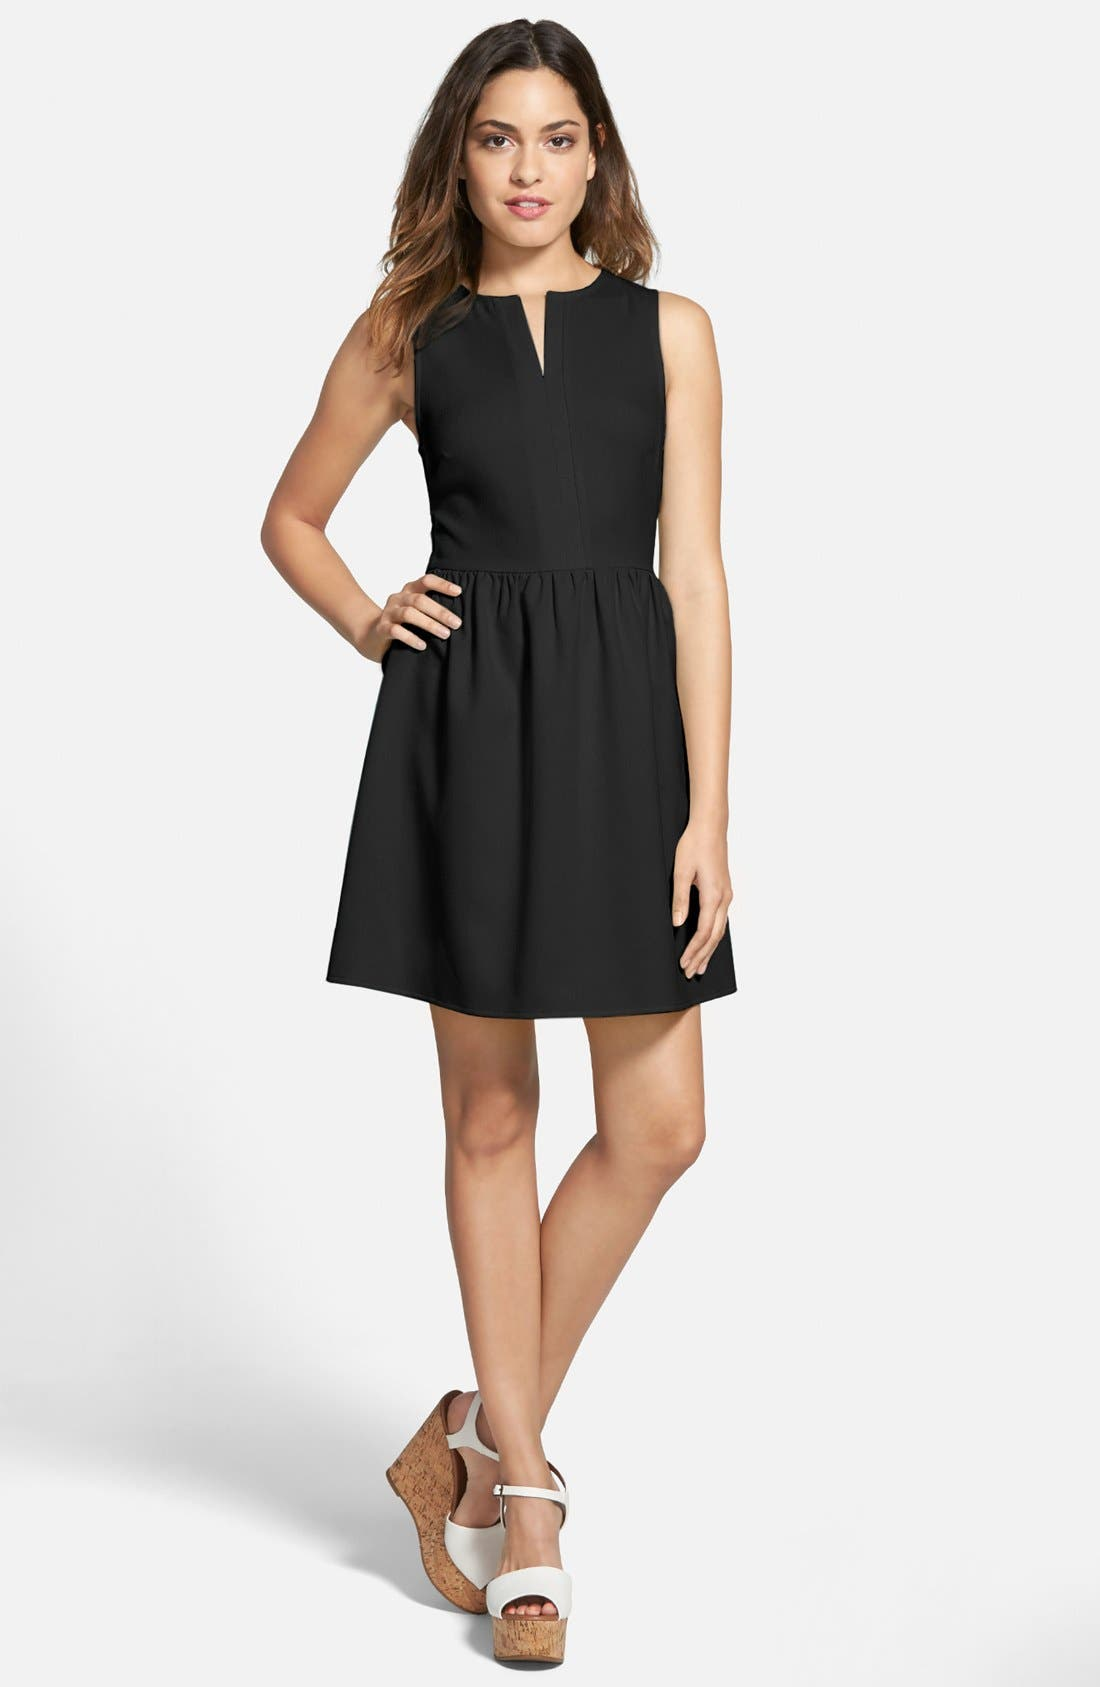 EVERLY 'Rowan' V-Neck Skater Dress, Main, color, 001